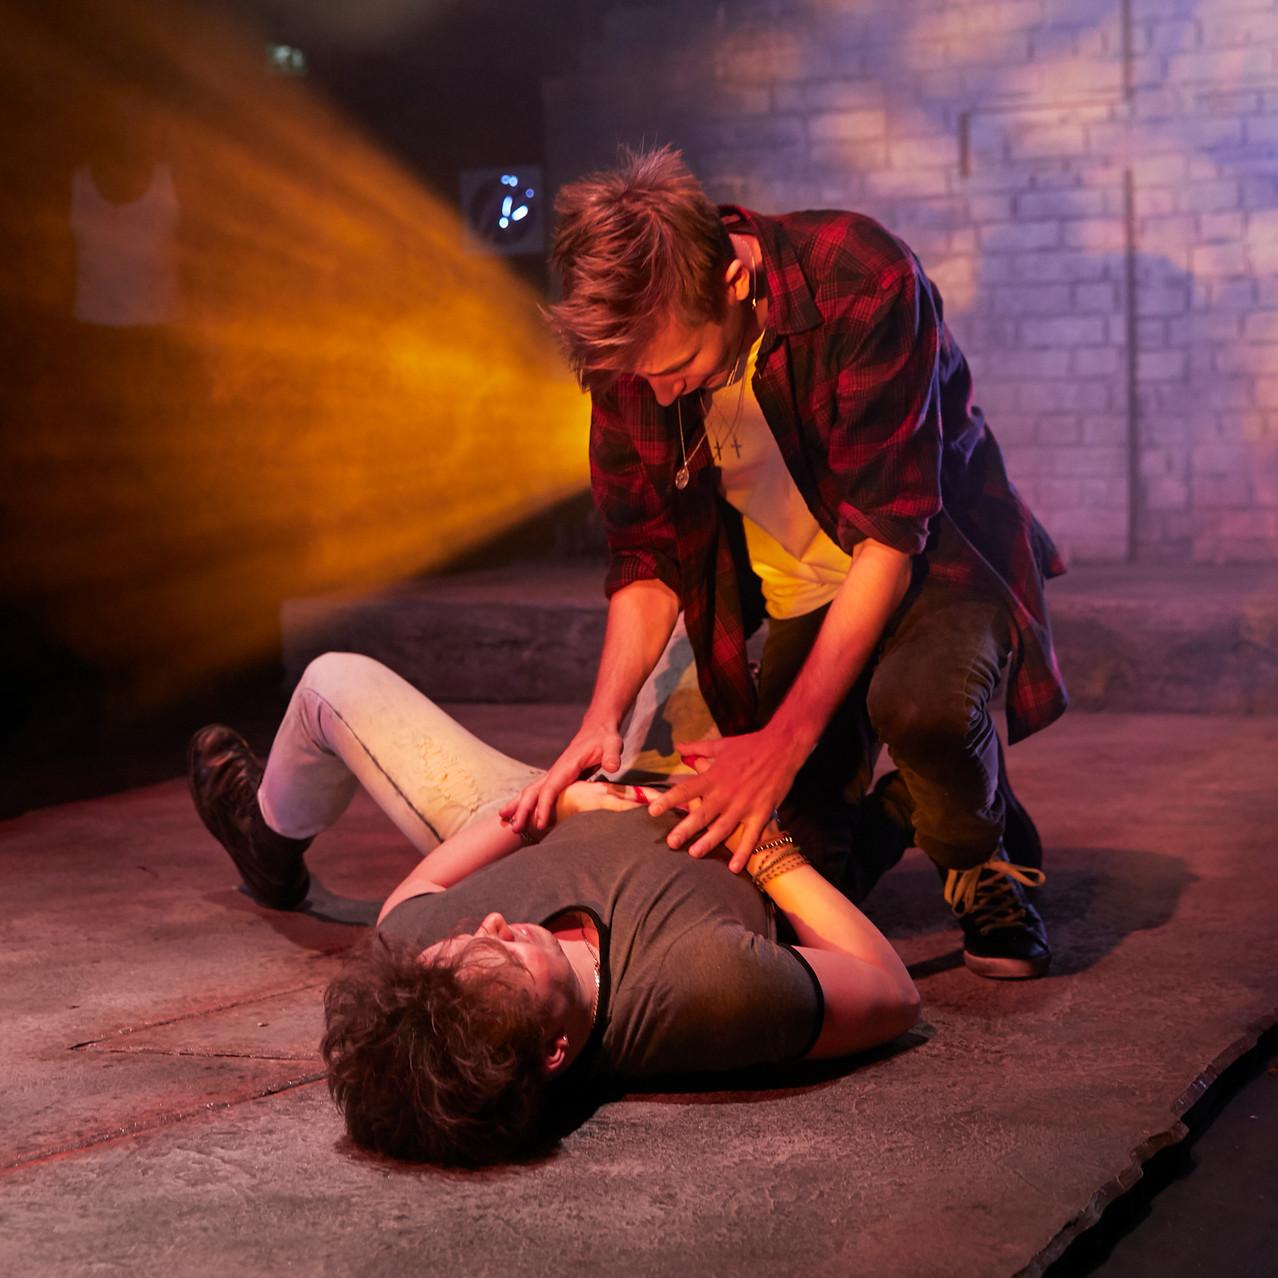 Romeo & Juliet - Mad Blood Stirring